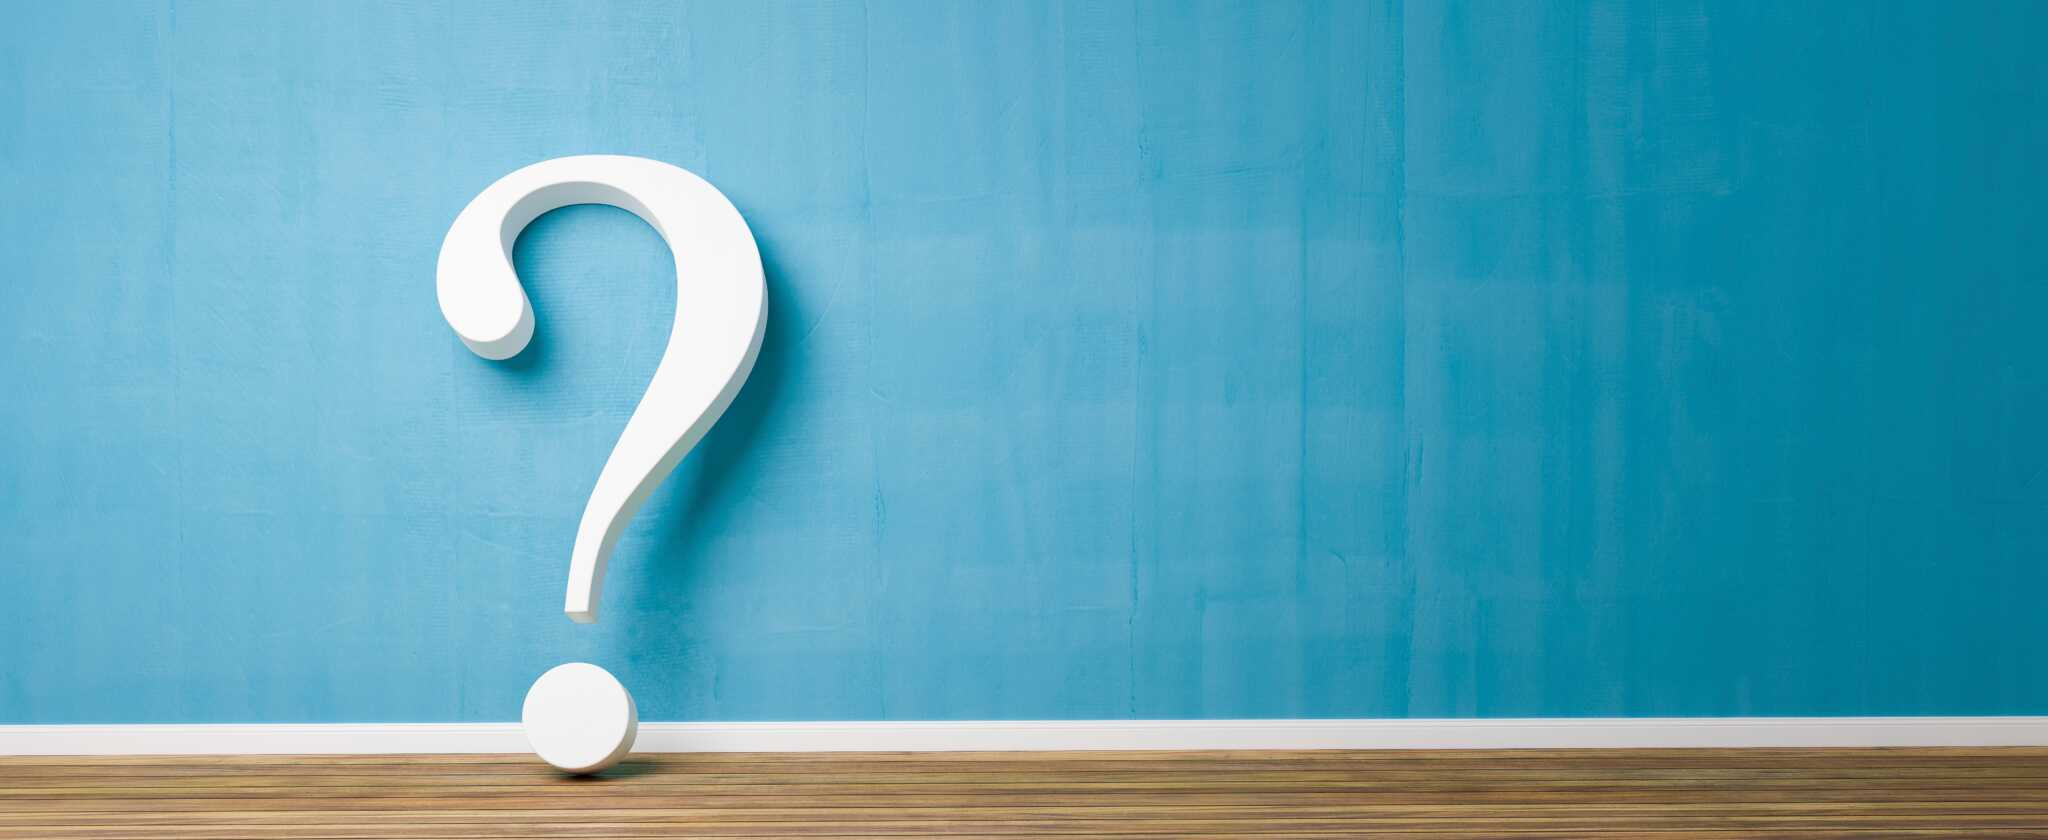 white question mark against blue wall